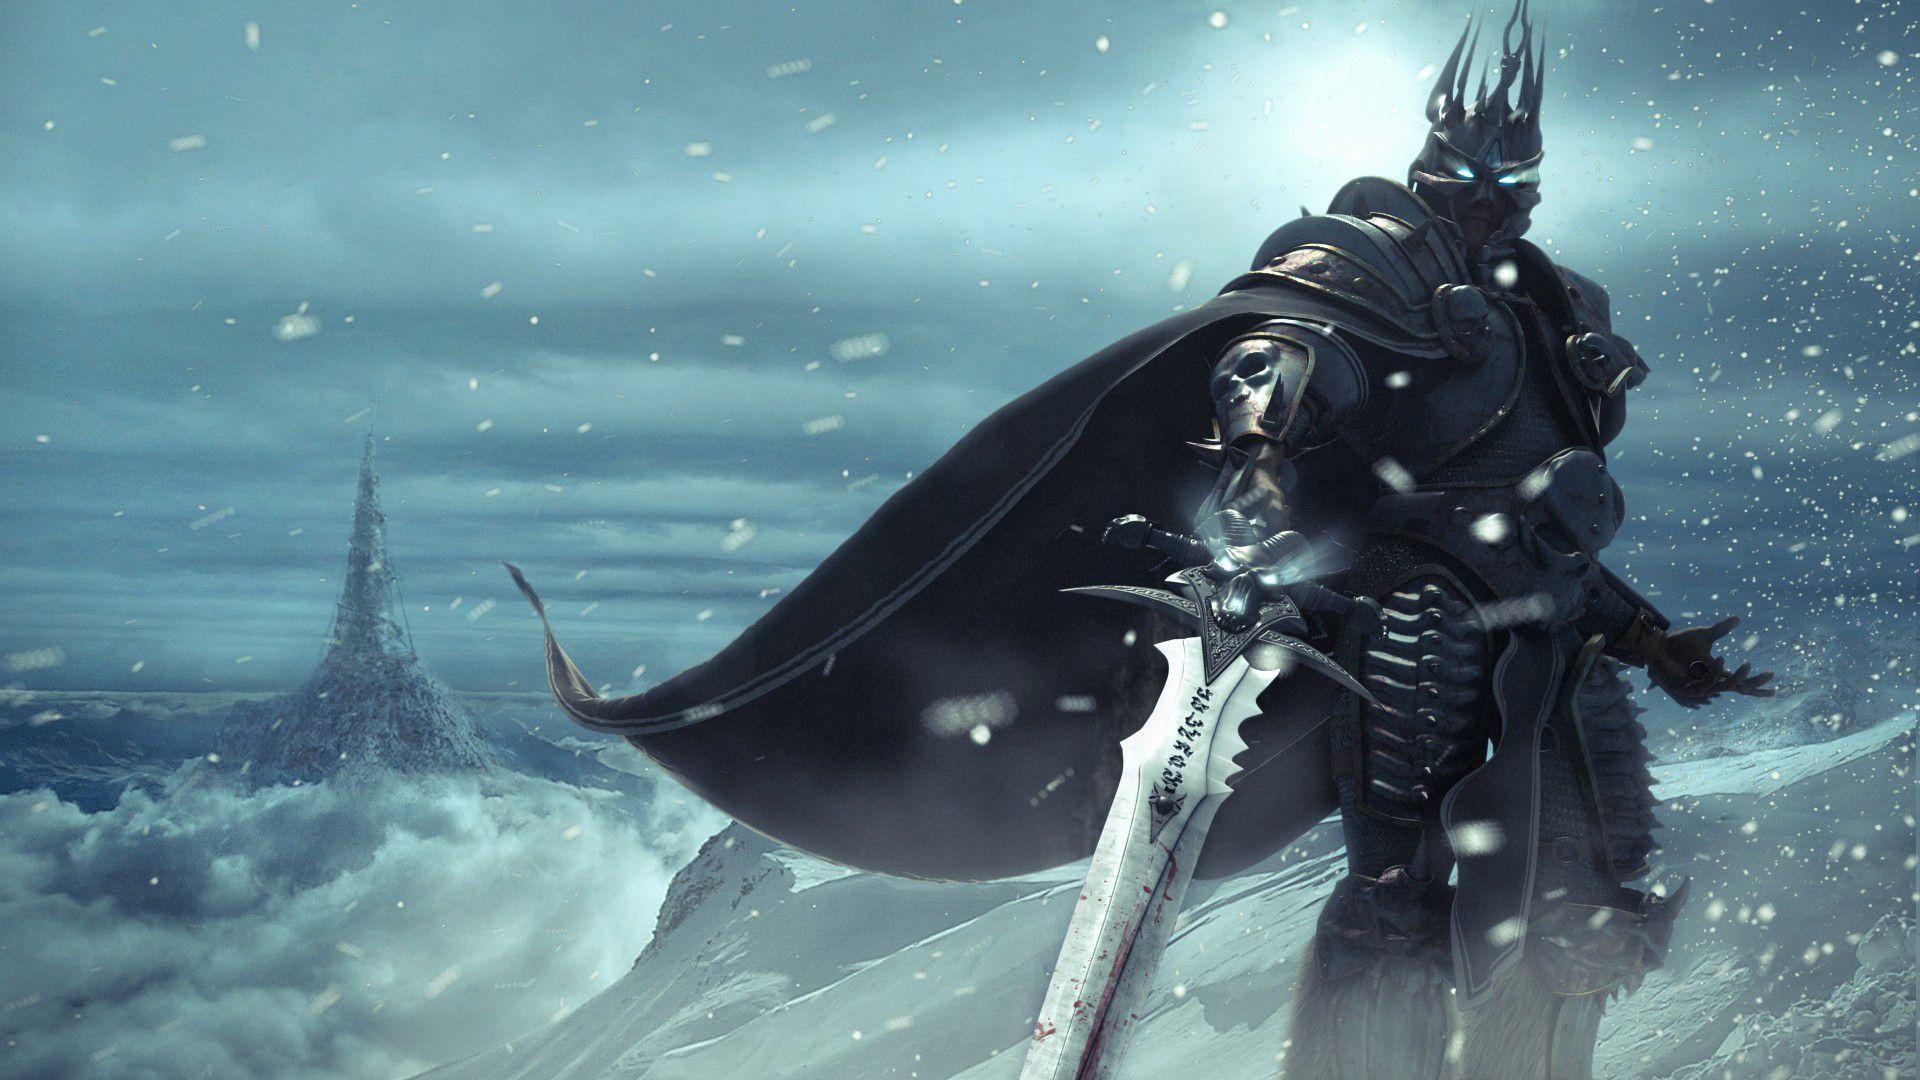 World Of Warcraft, Wrath Of The Lich King HD desktop wallpaper ...